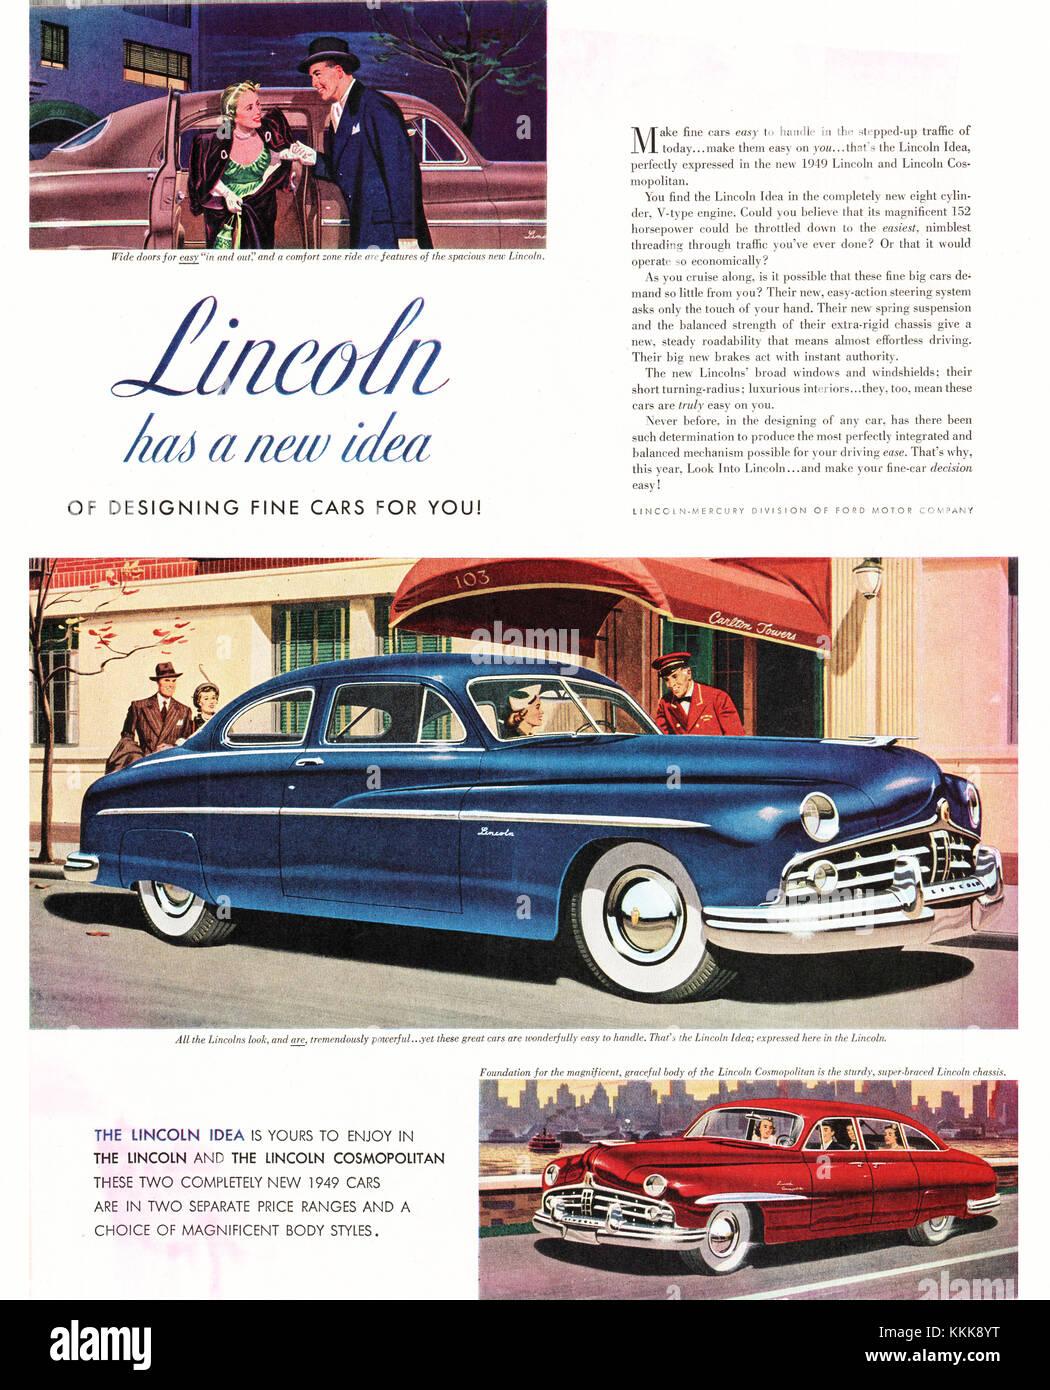 1948 U.S. Magazine Chevrolet Lincoln Car Advert Stock Photo ...